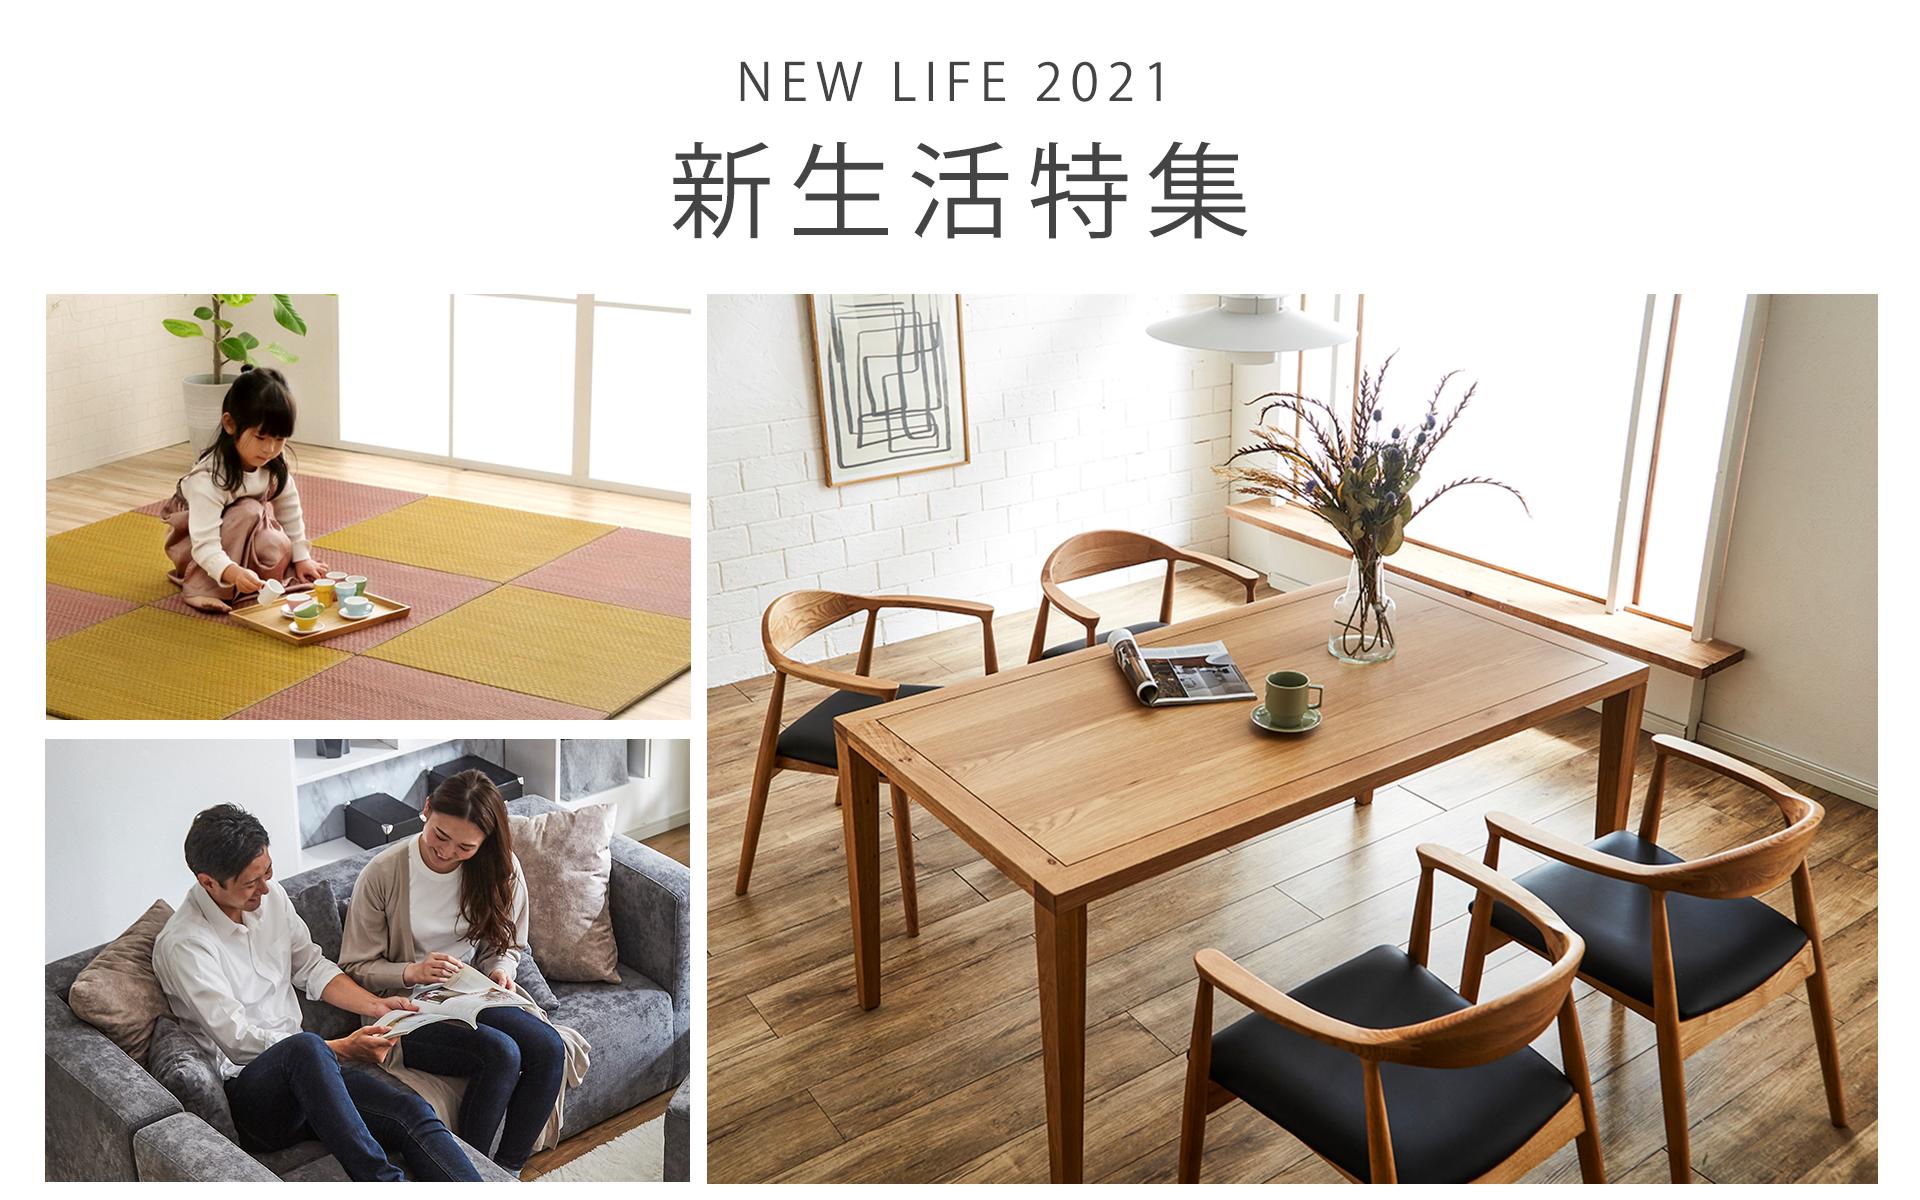 NEW LIFE 2021 新生活特集